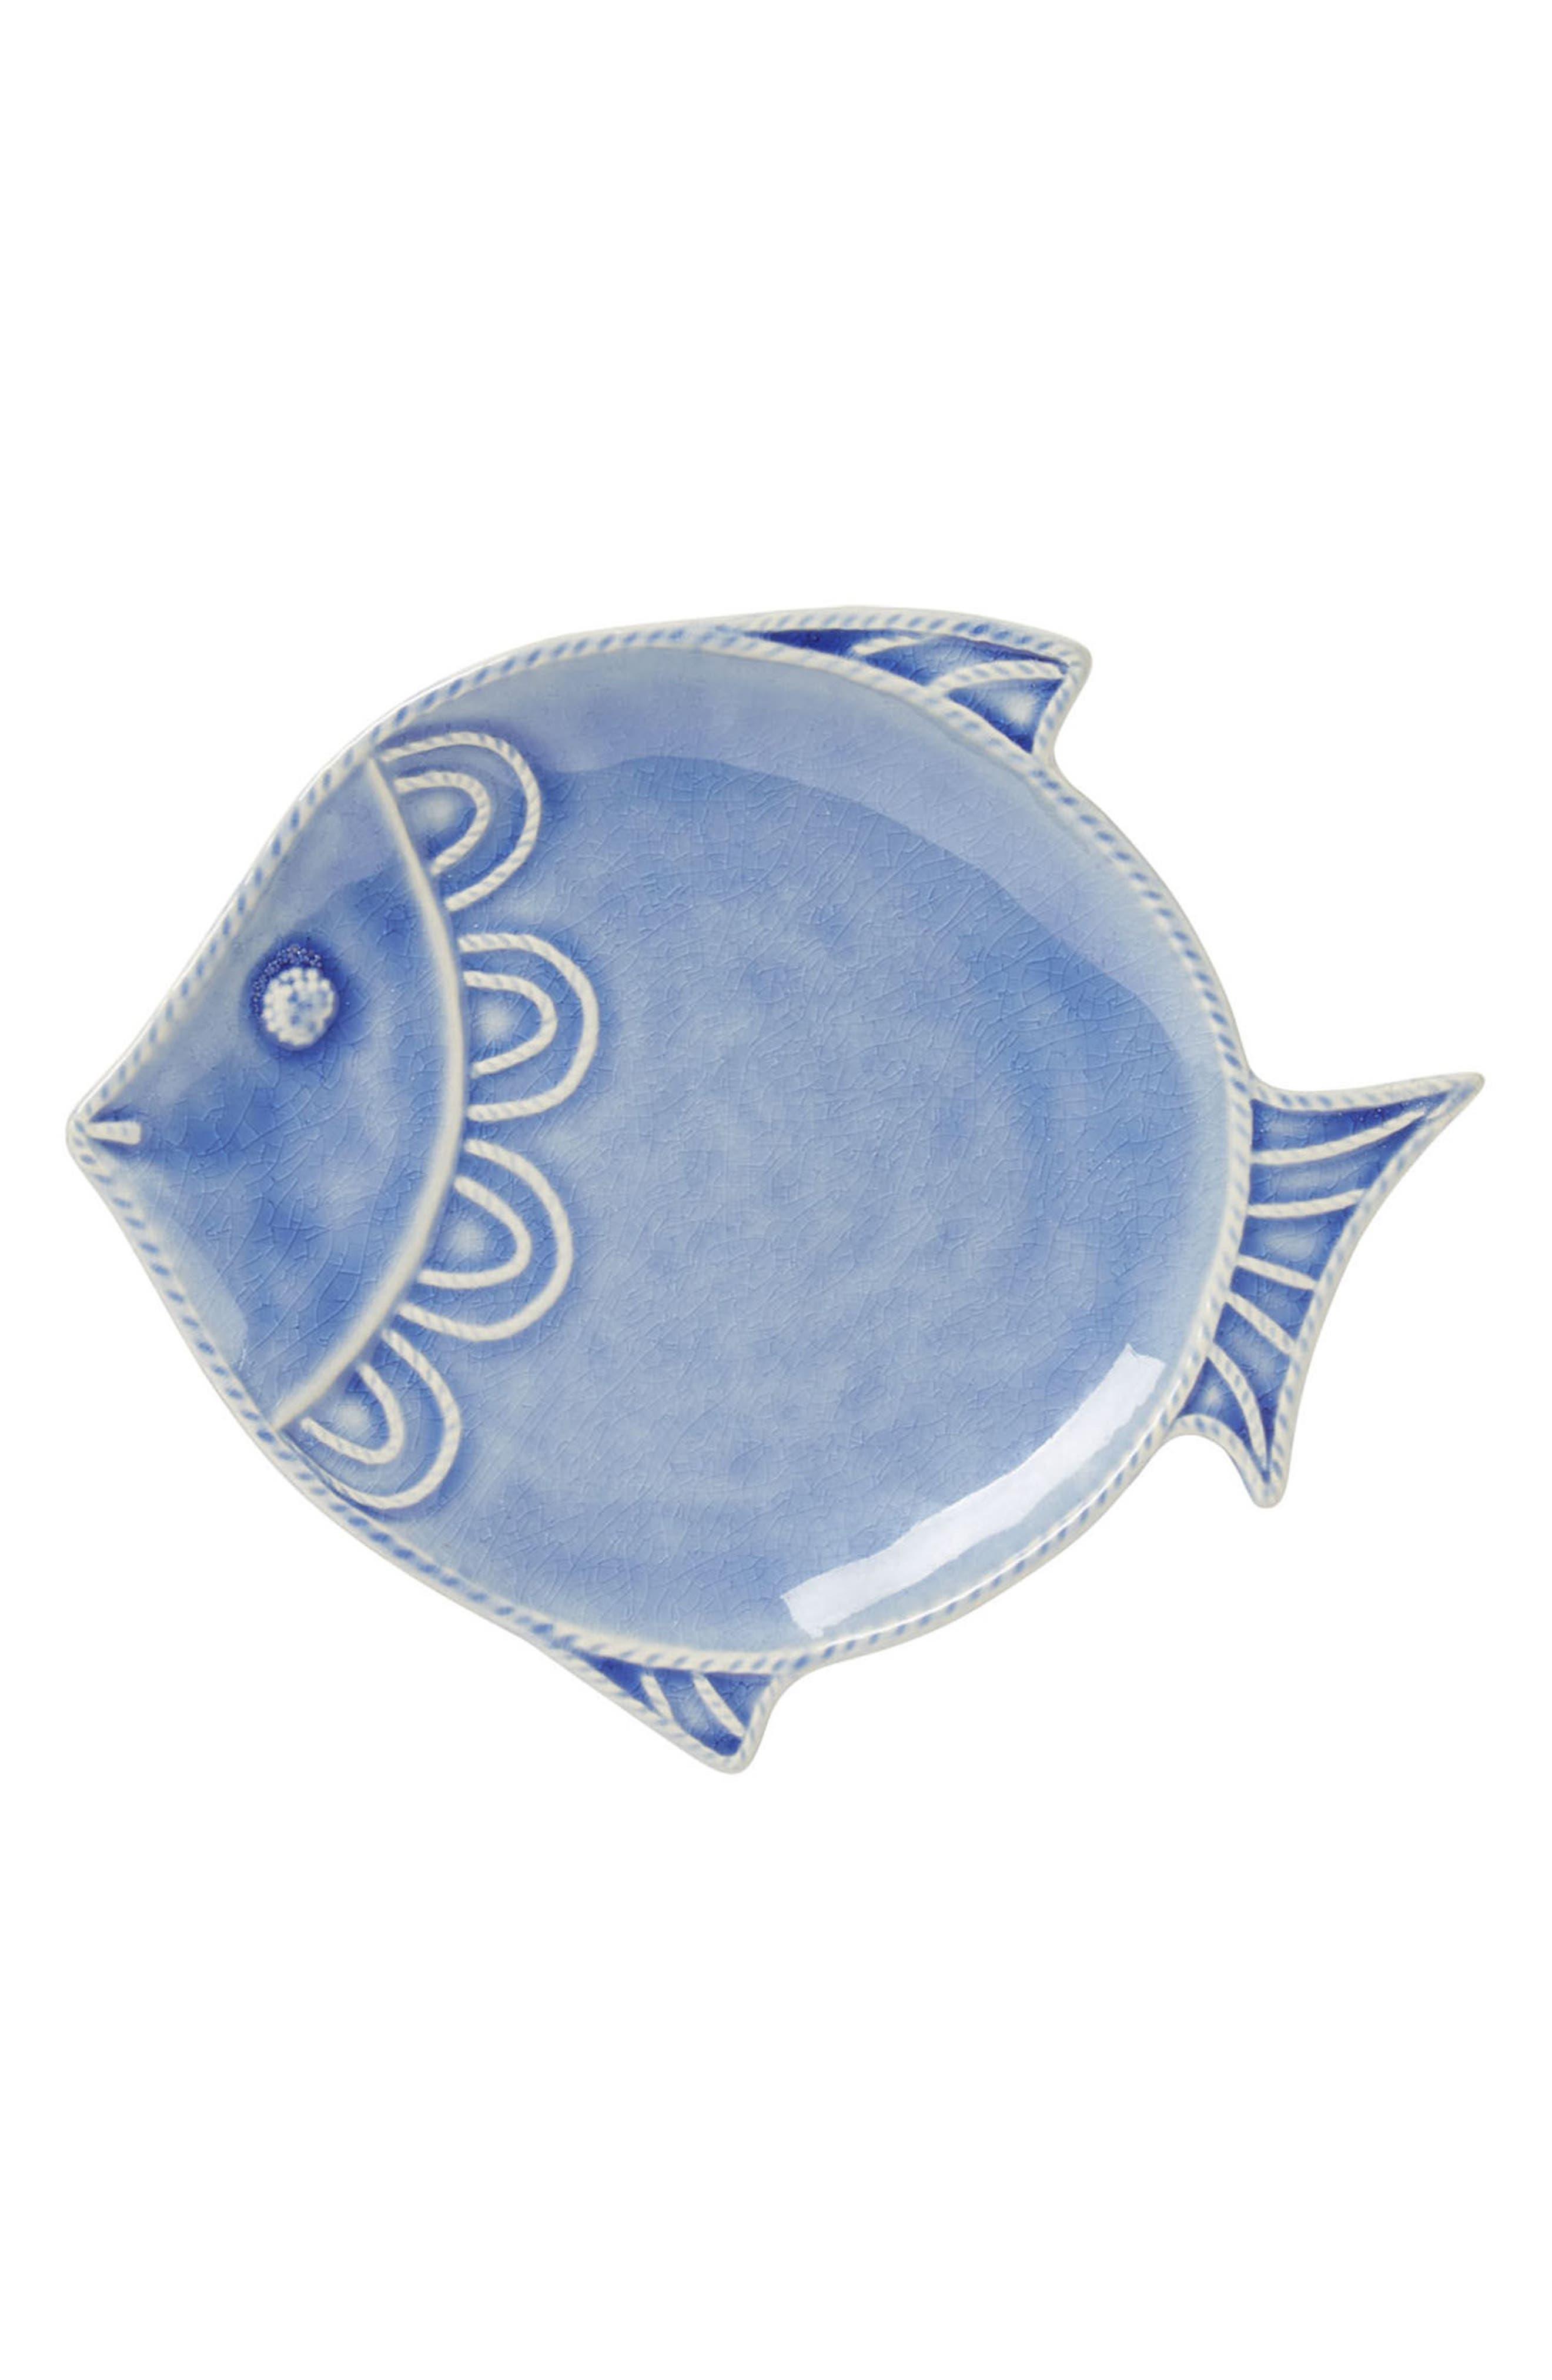 Berry & Thread Ceramic Fish Plate,                             Main thumbnail 1, color,                             DELFT BLUE